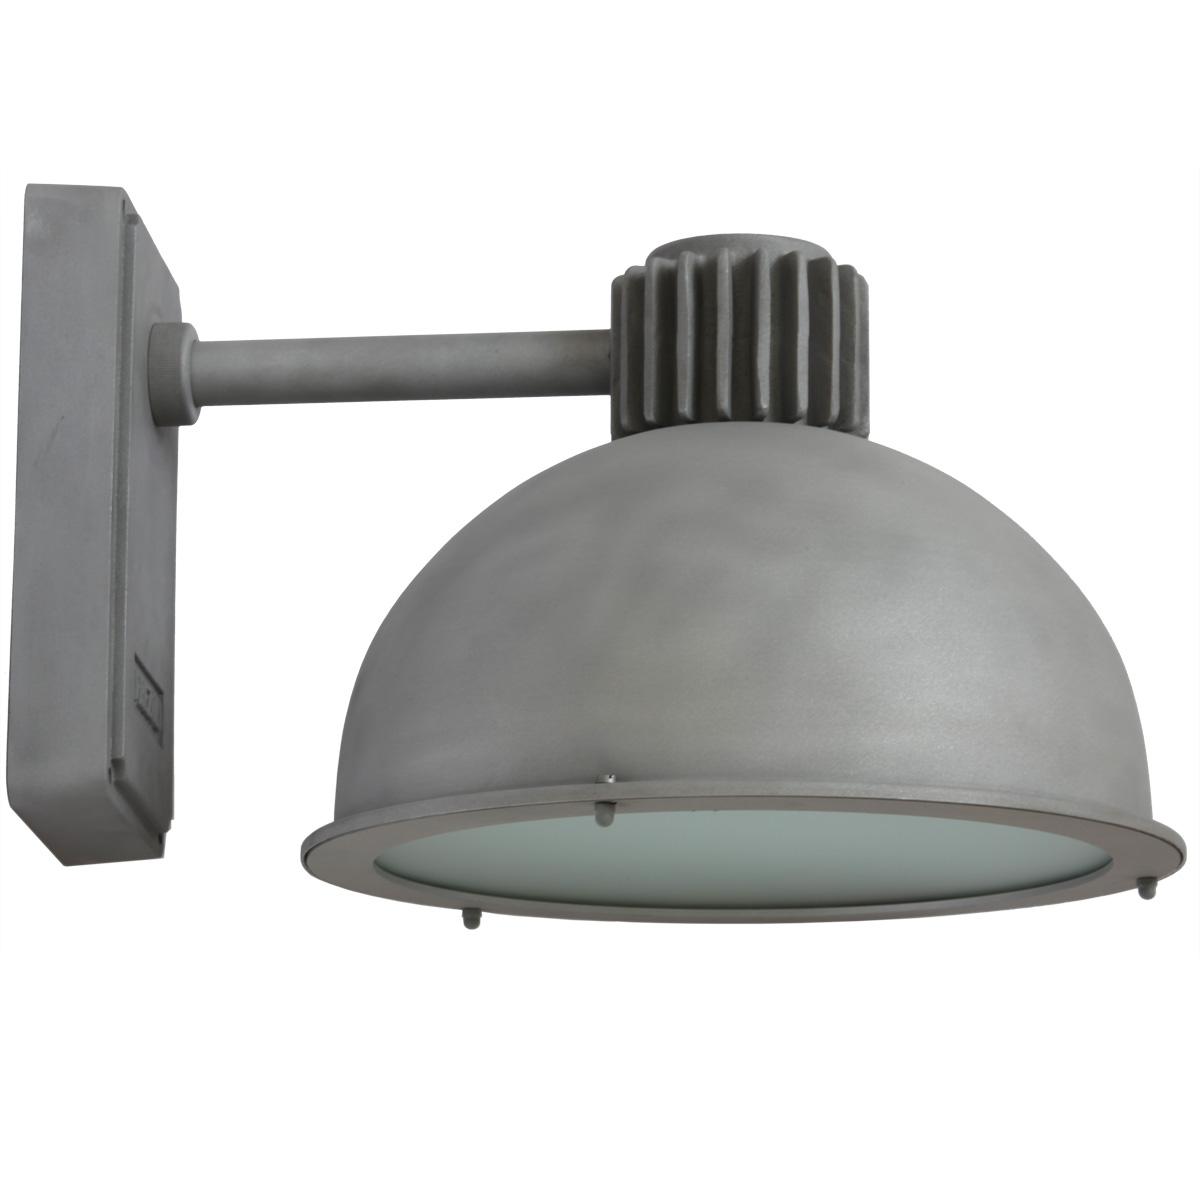 Industrial Style Outdoor Wall Lights : Industrial Style Aluminum Wall Light RAS - Terra Lumi